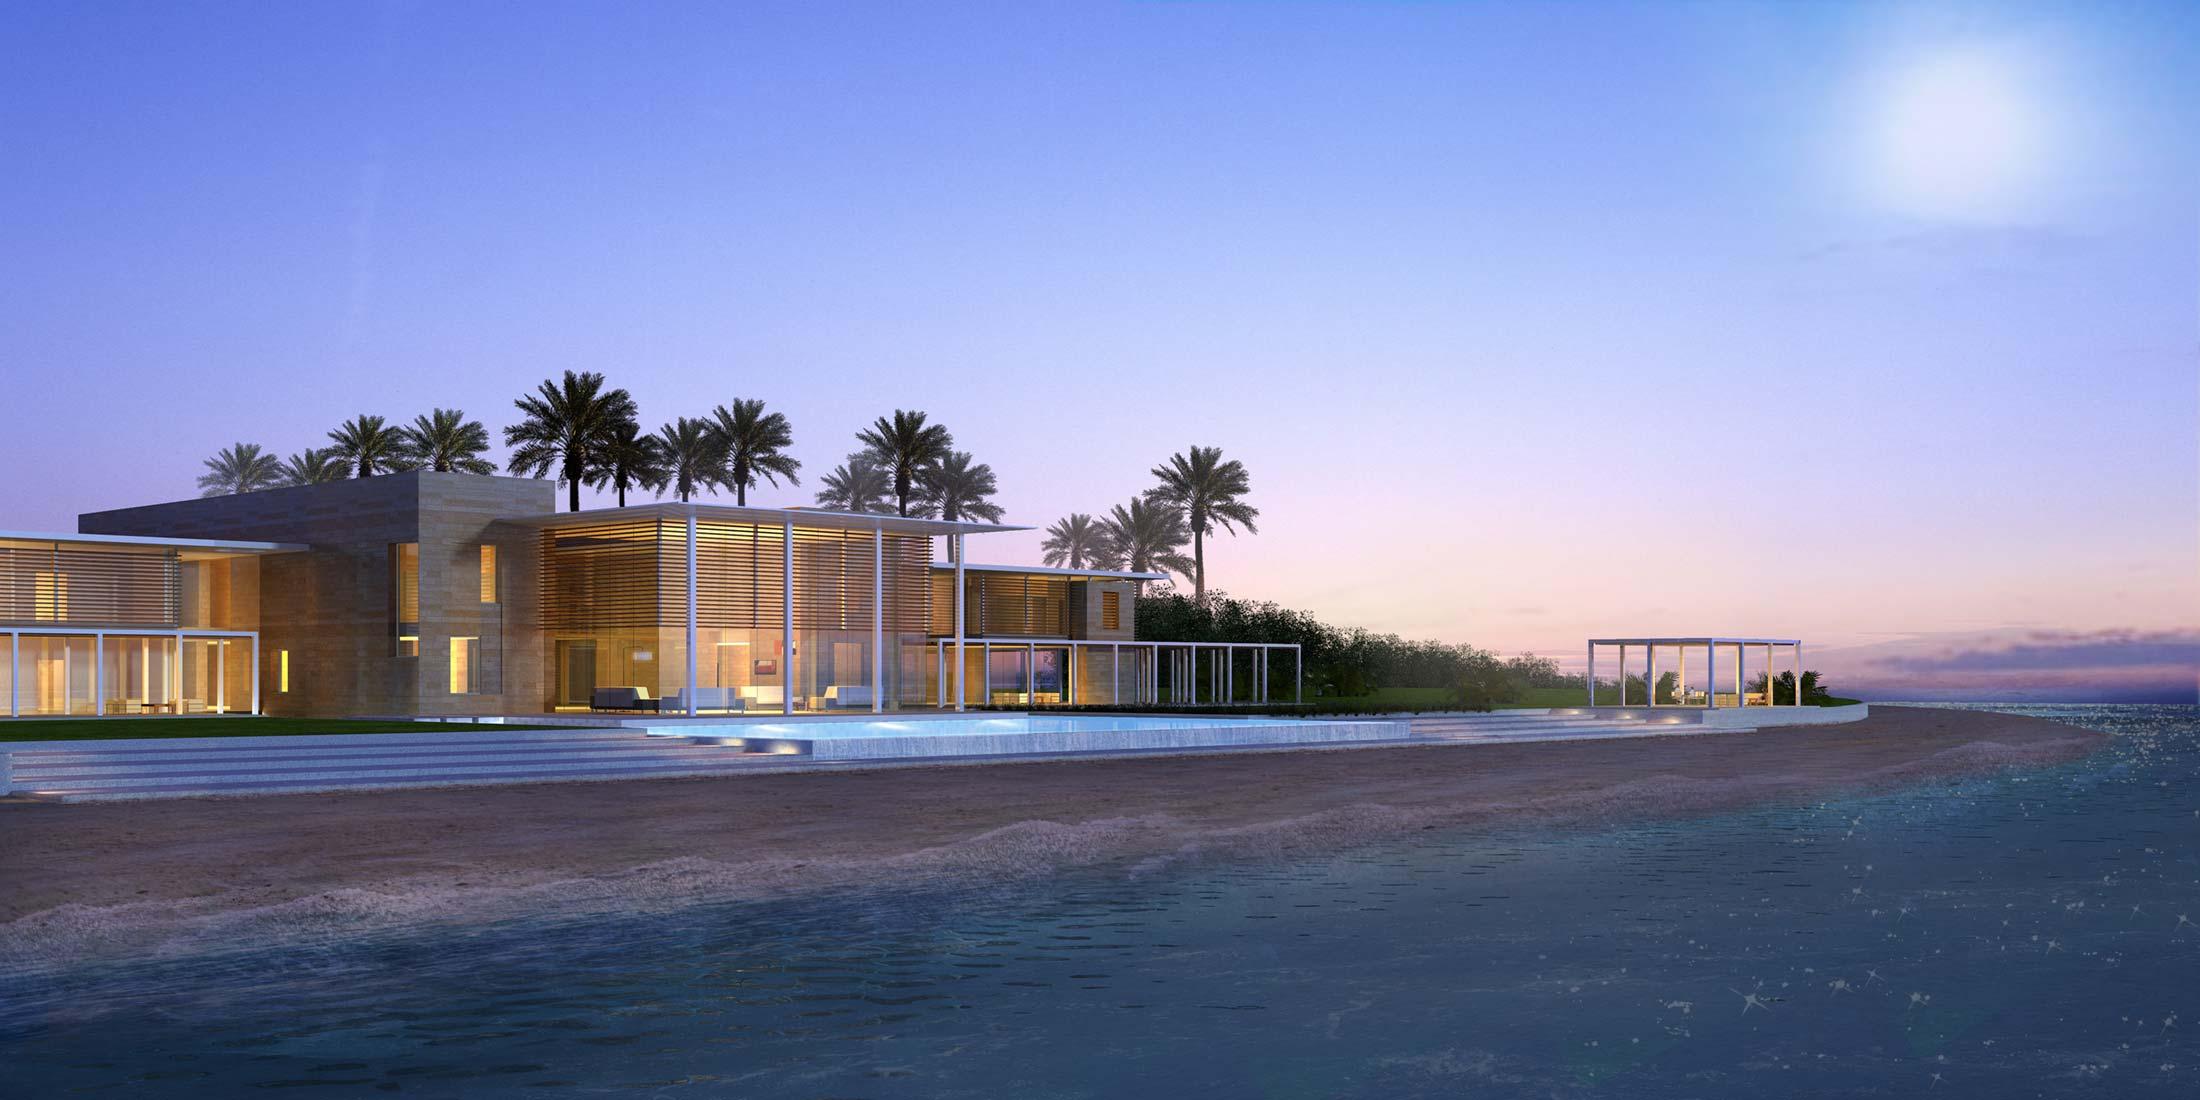 modern-architecture-residential-estate-uae-pool-water-shubindonaldson-dubai-villas-1